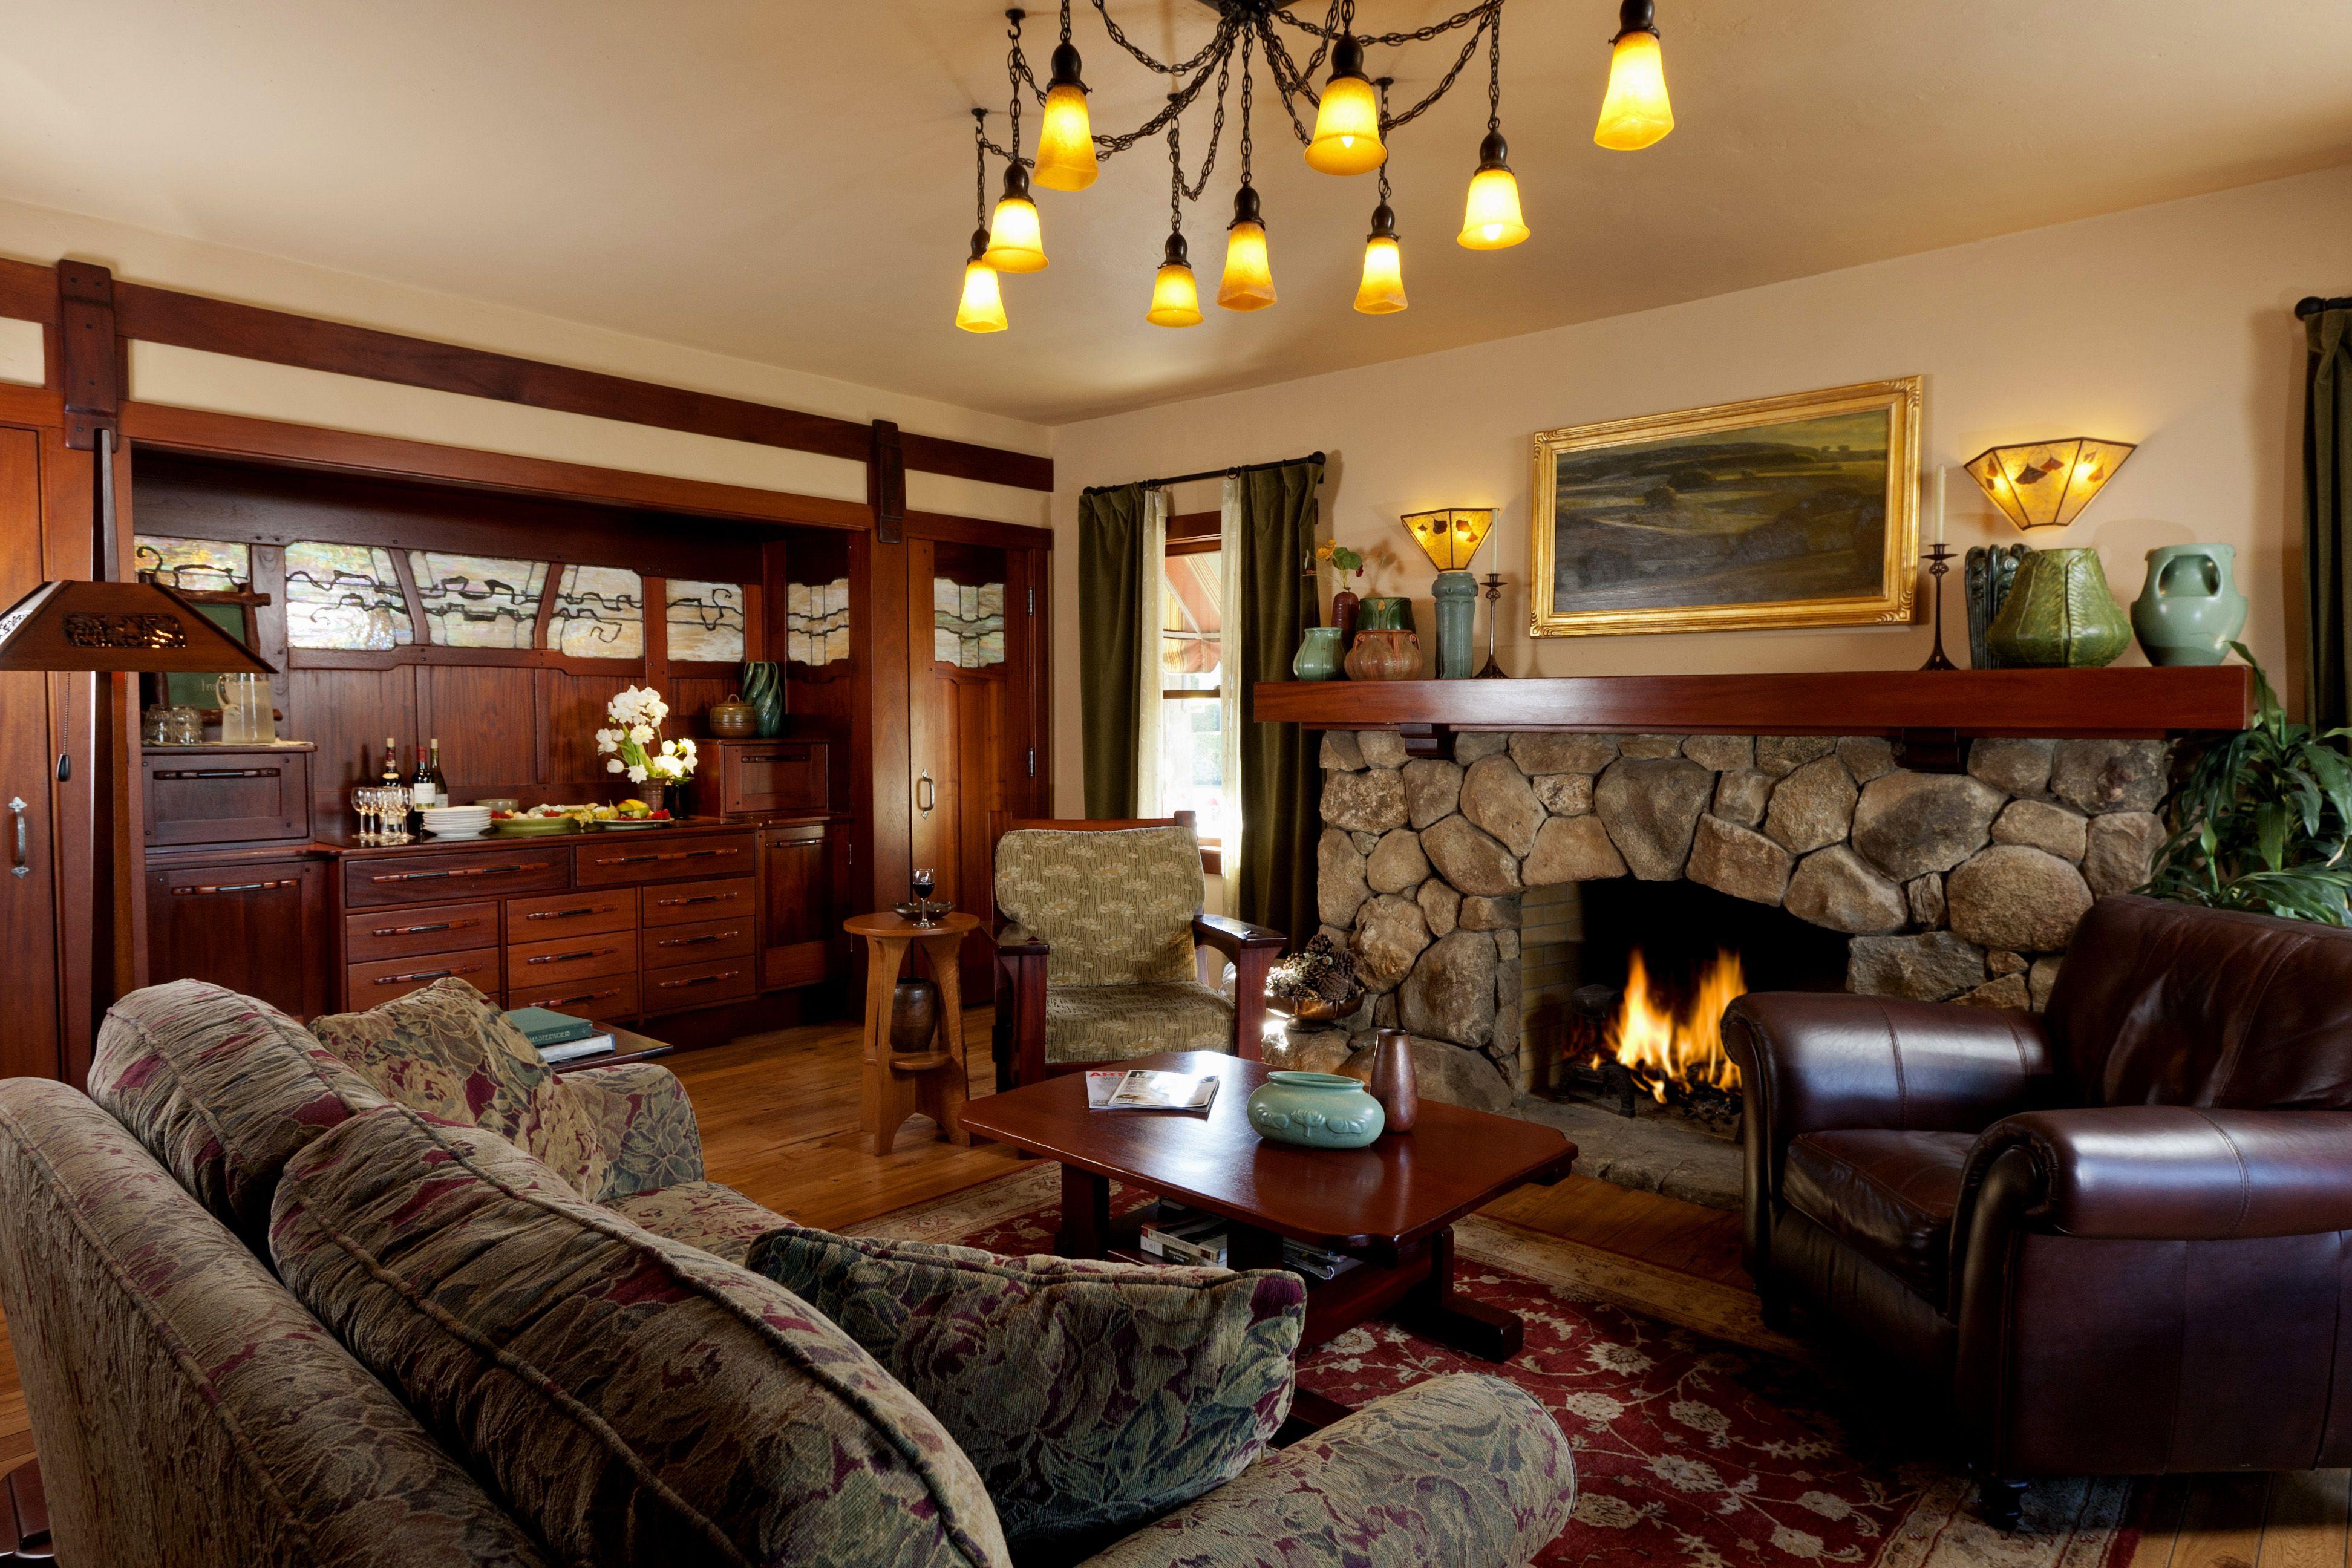 Enchanted Rose Room Beazley House Bed and Breakfast Inn